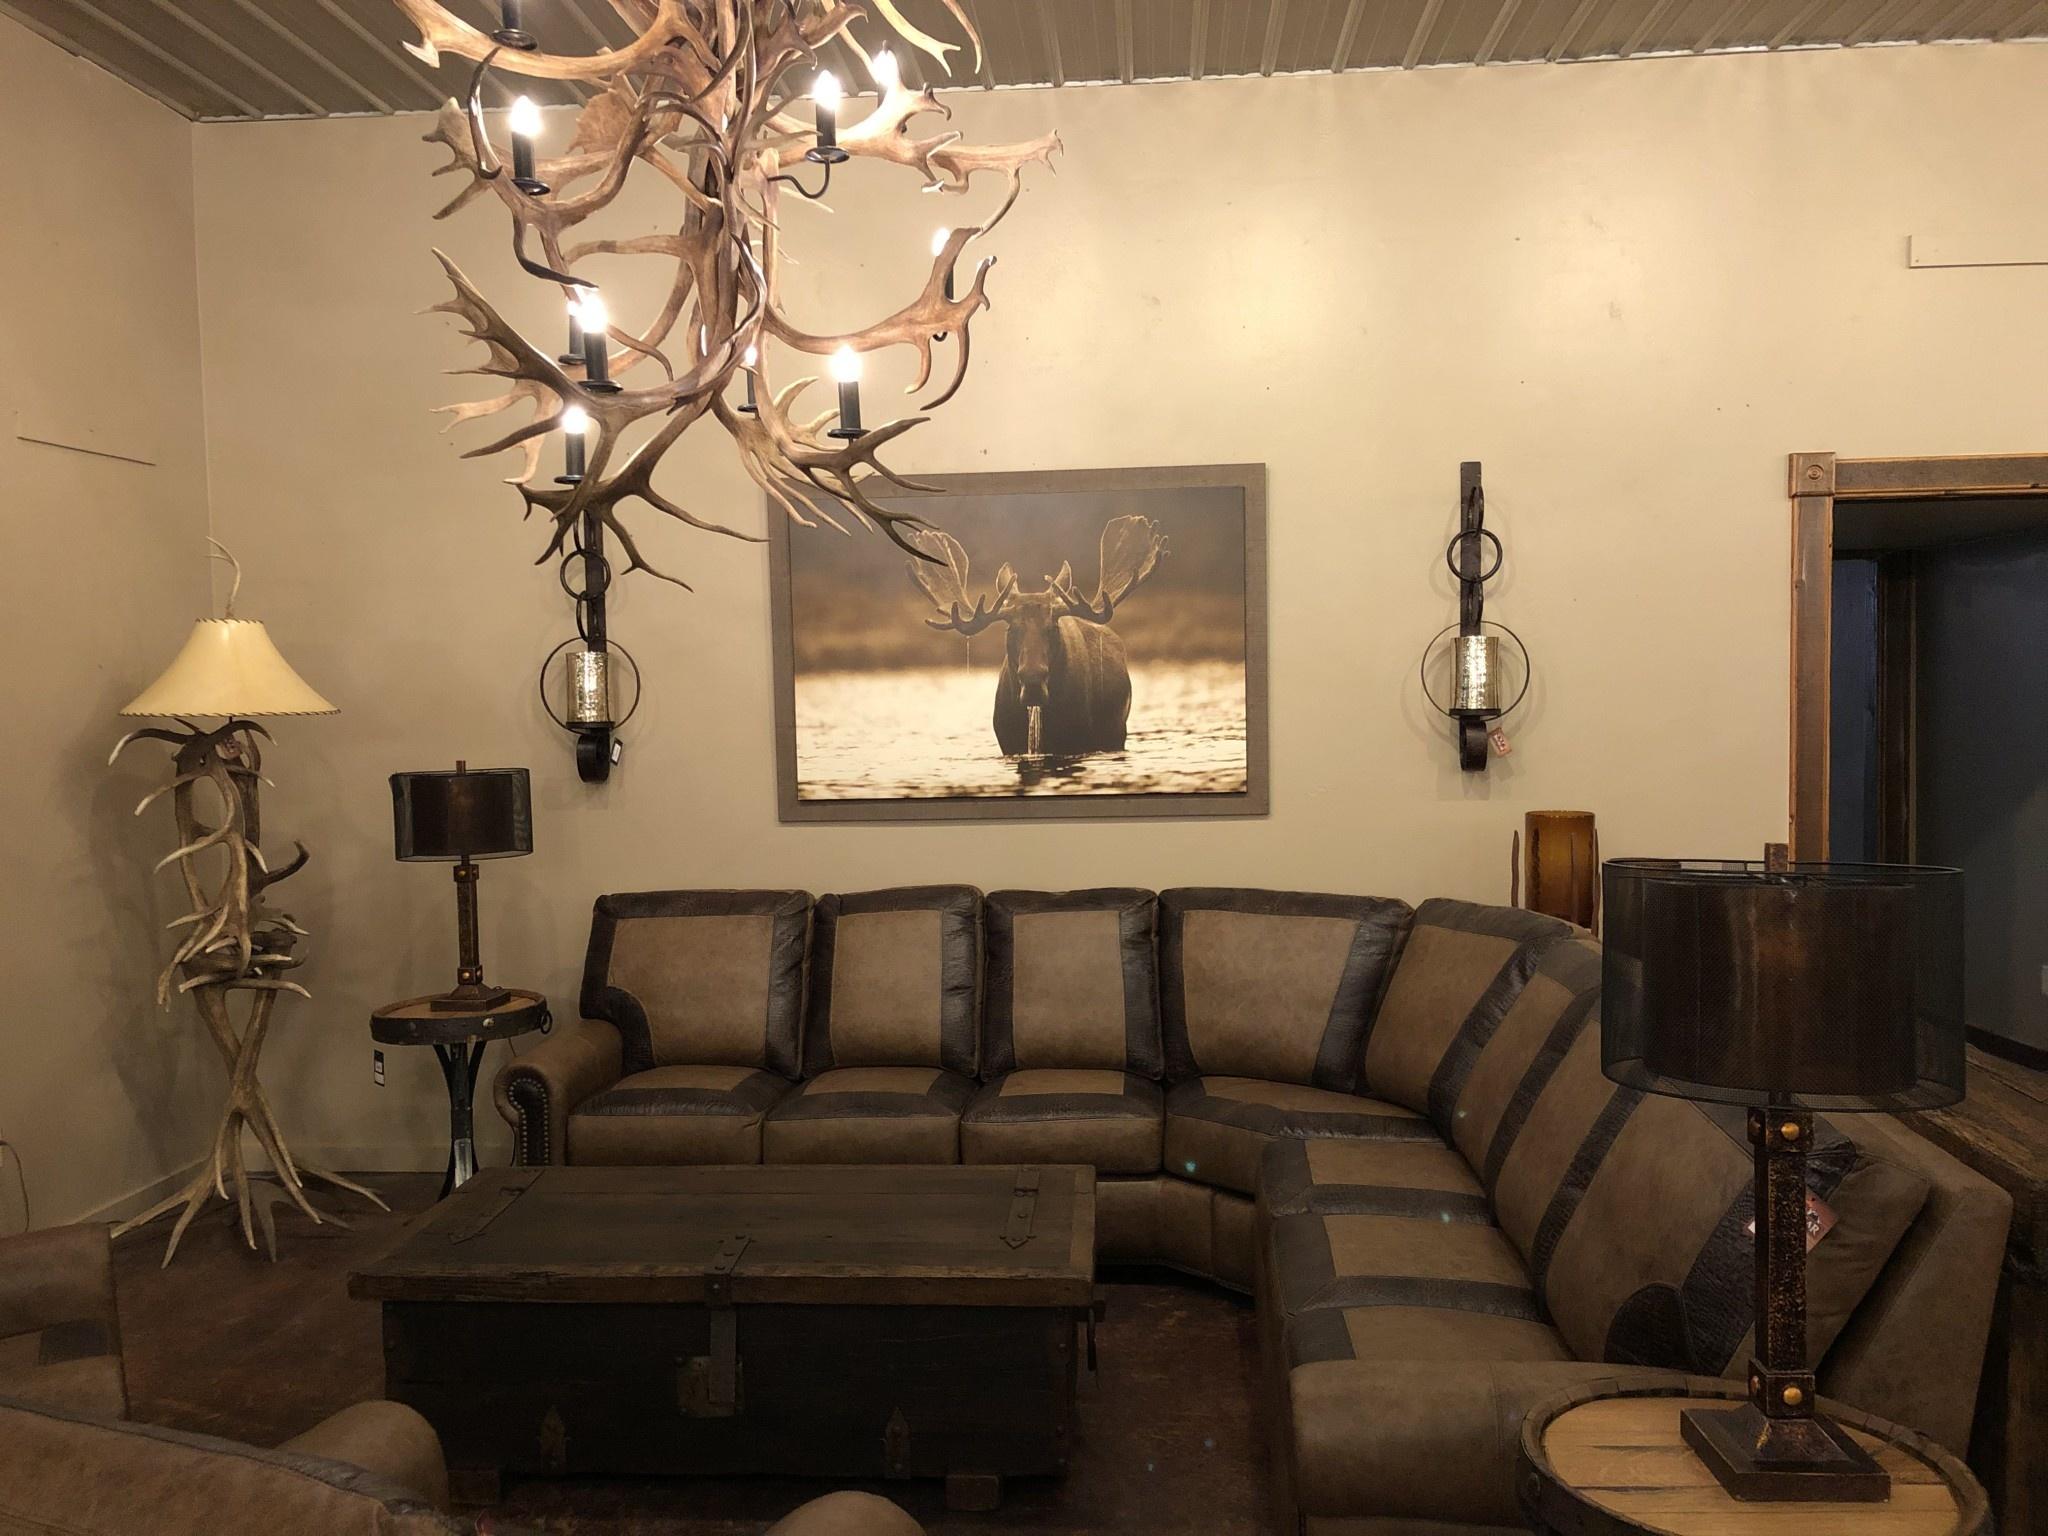 Artisans Old Wood Chunky Baul Coffee Table 60x30x20H